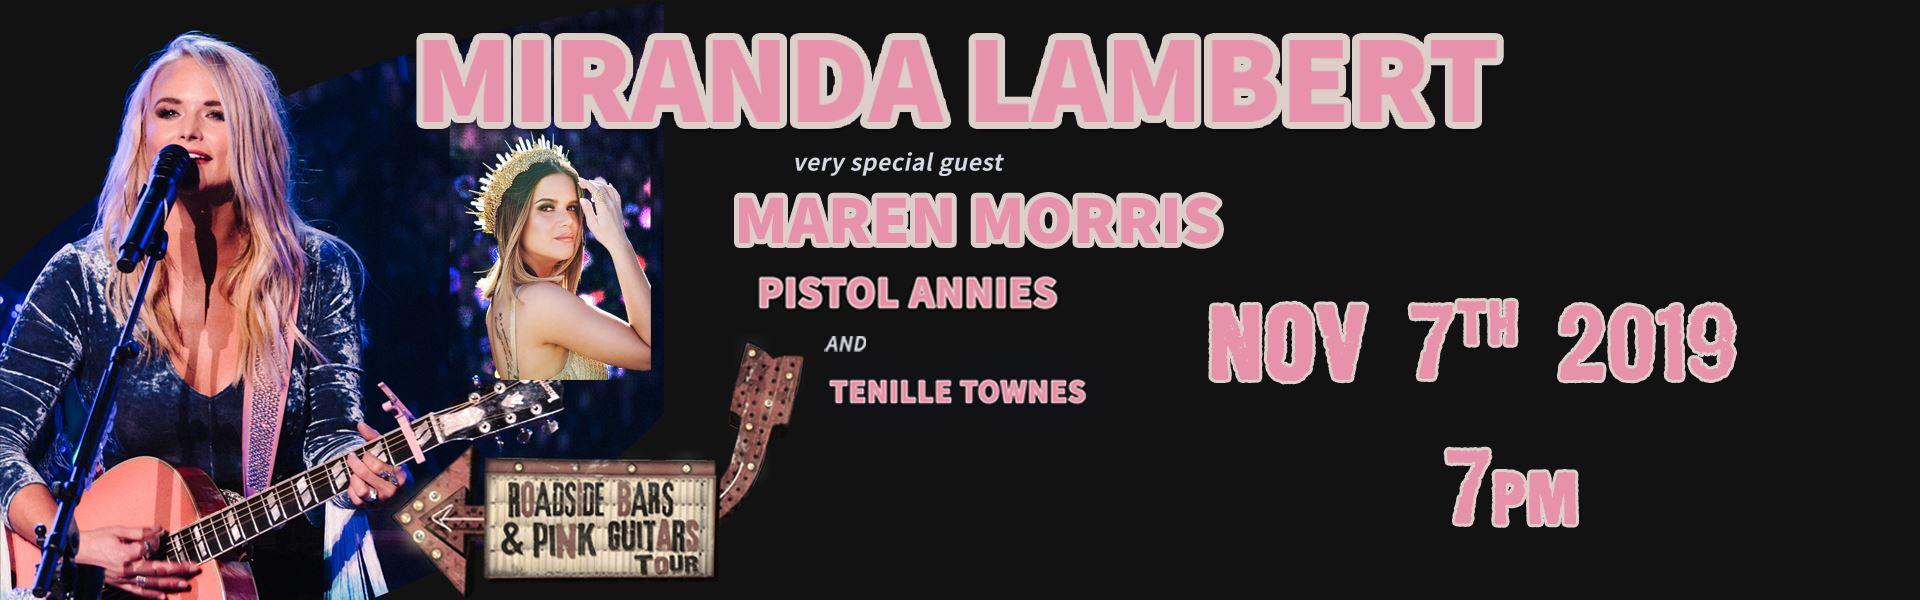 Miranda Lambert with Maren Morris, Pistol Annies & Tennile Townes